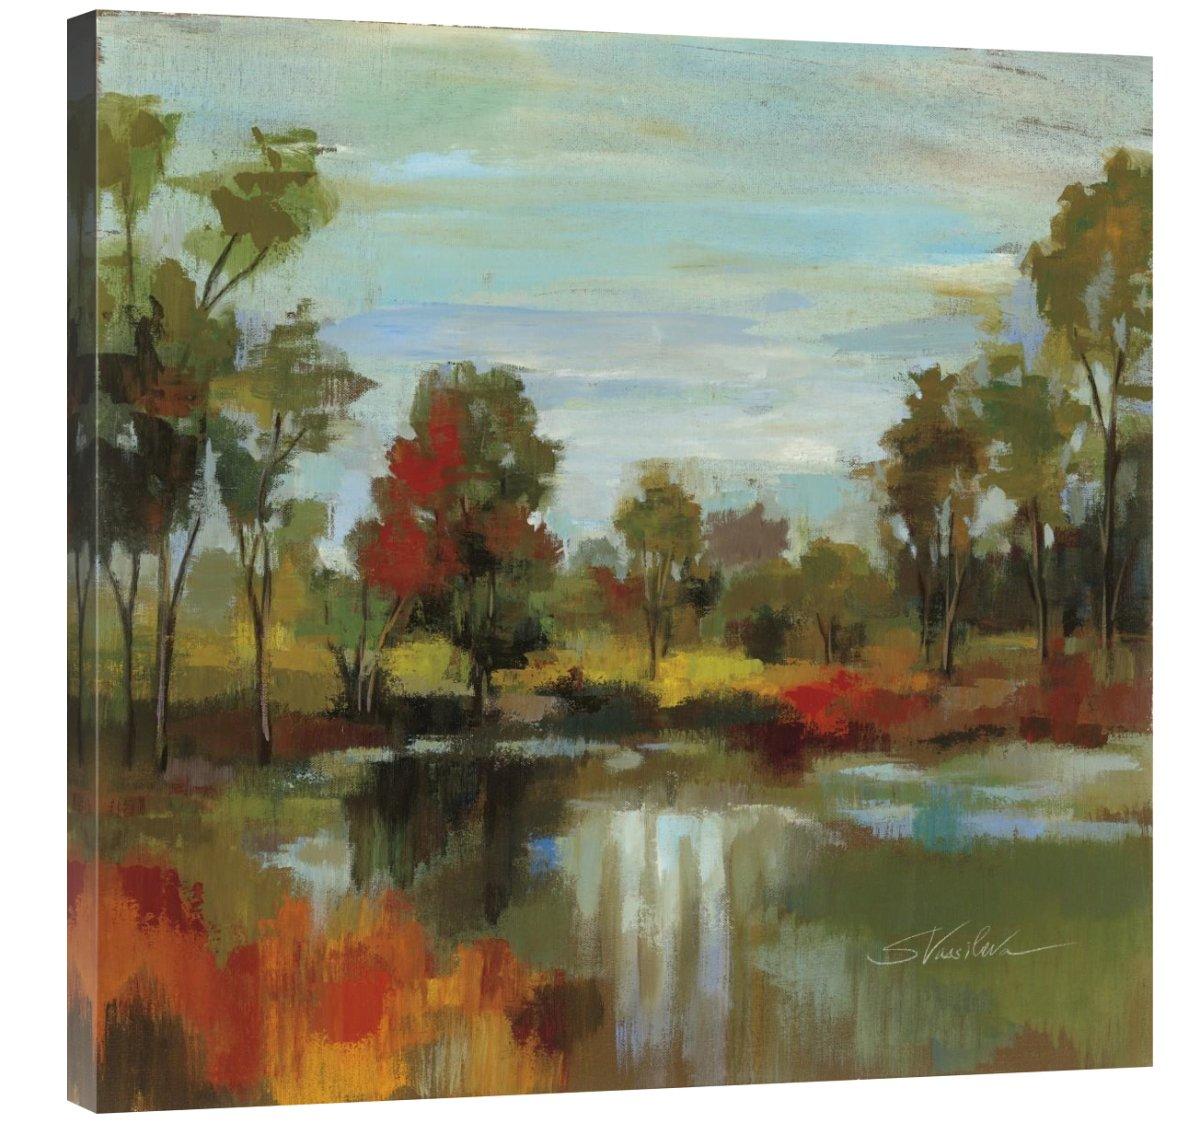 Global Gallery Silvia Vassileva, Hidden Pond Hues I' Giclee Stretched Canvas Artwork 30 x 30